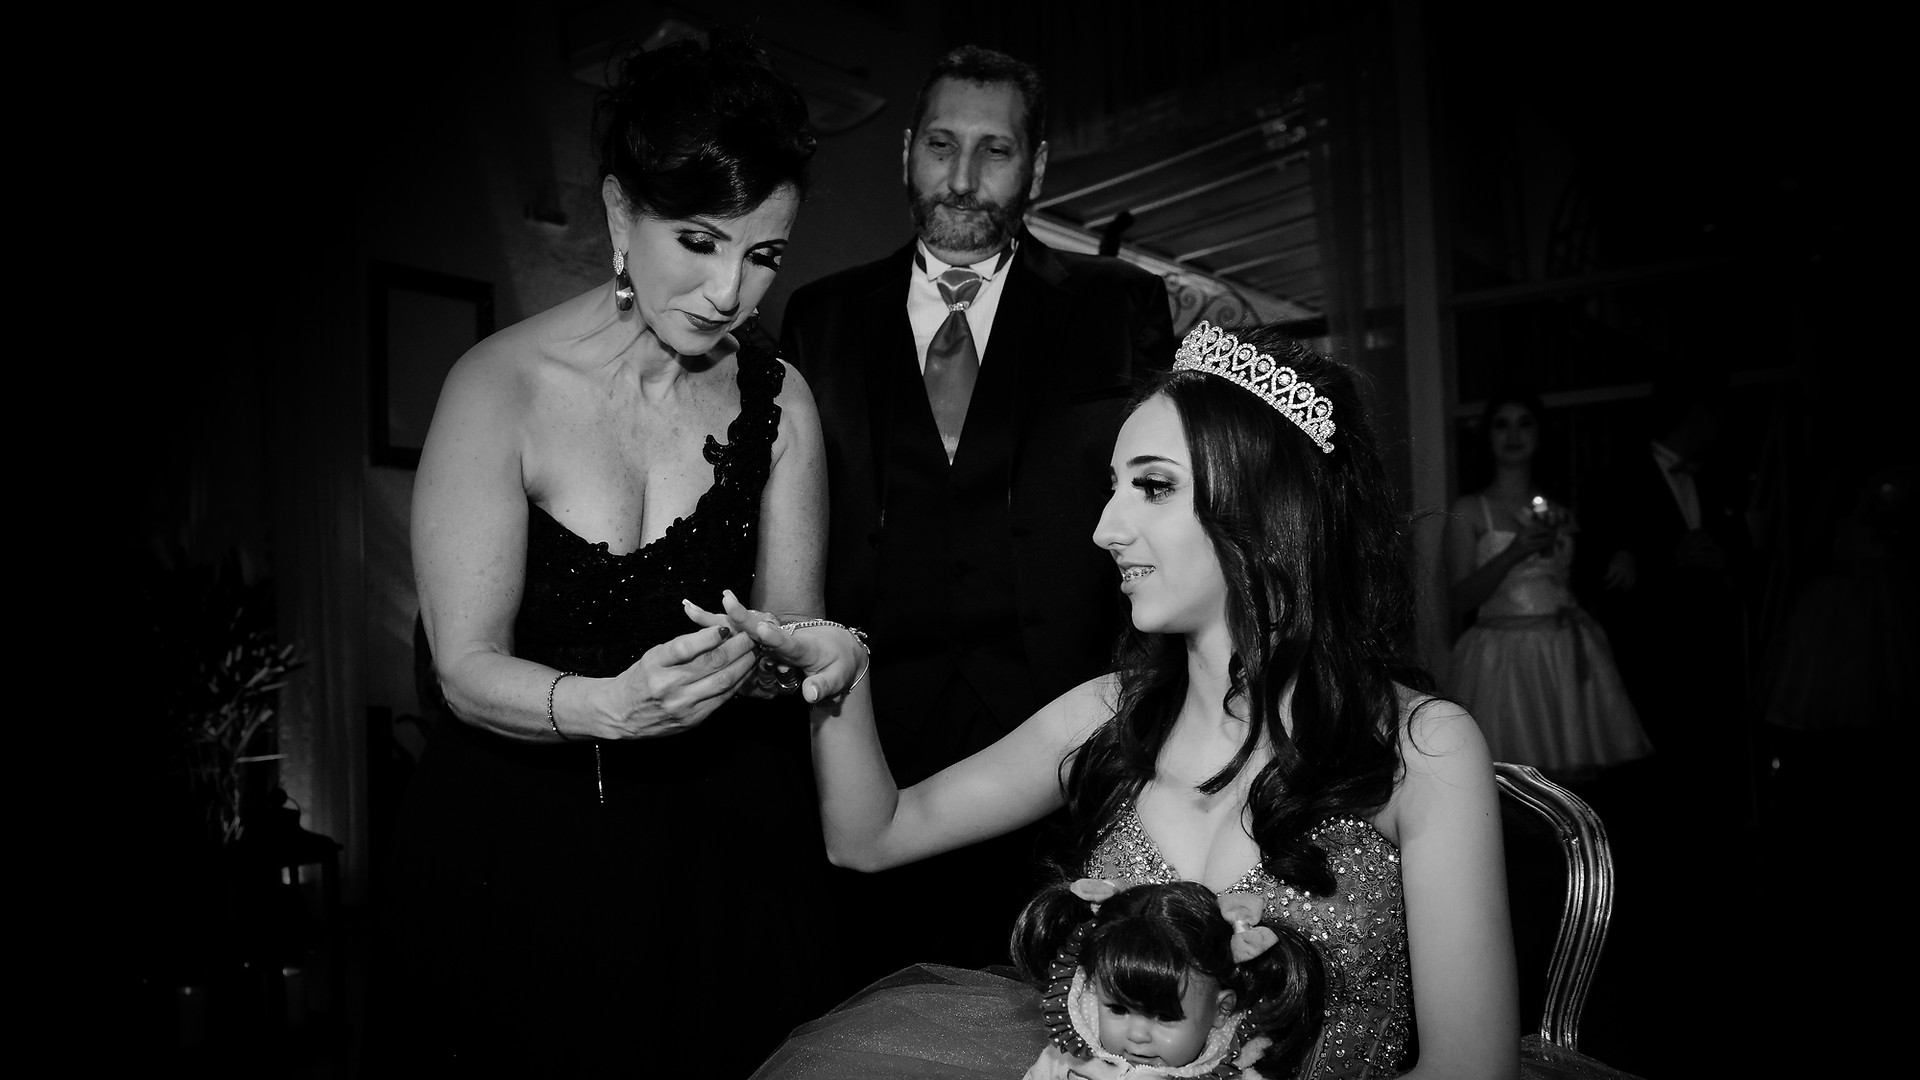 debutante recebendo anel